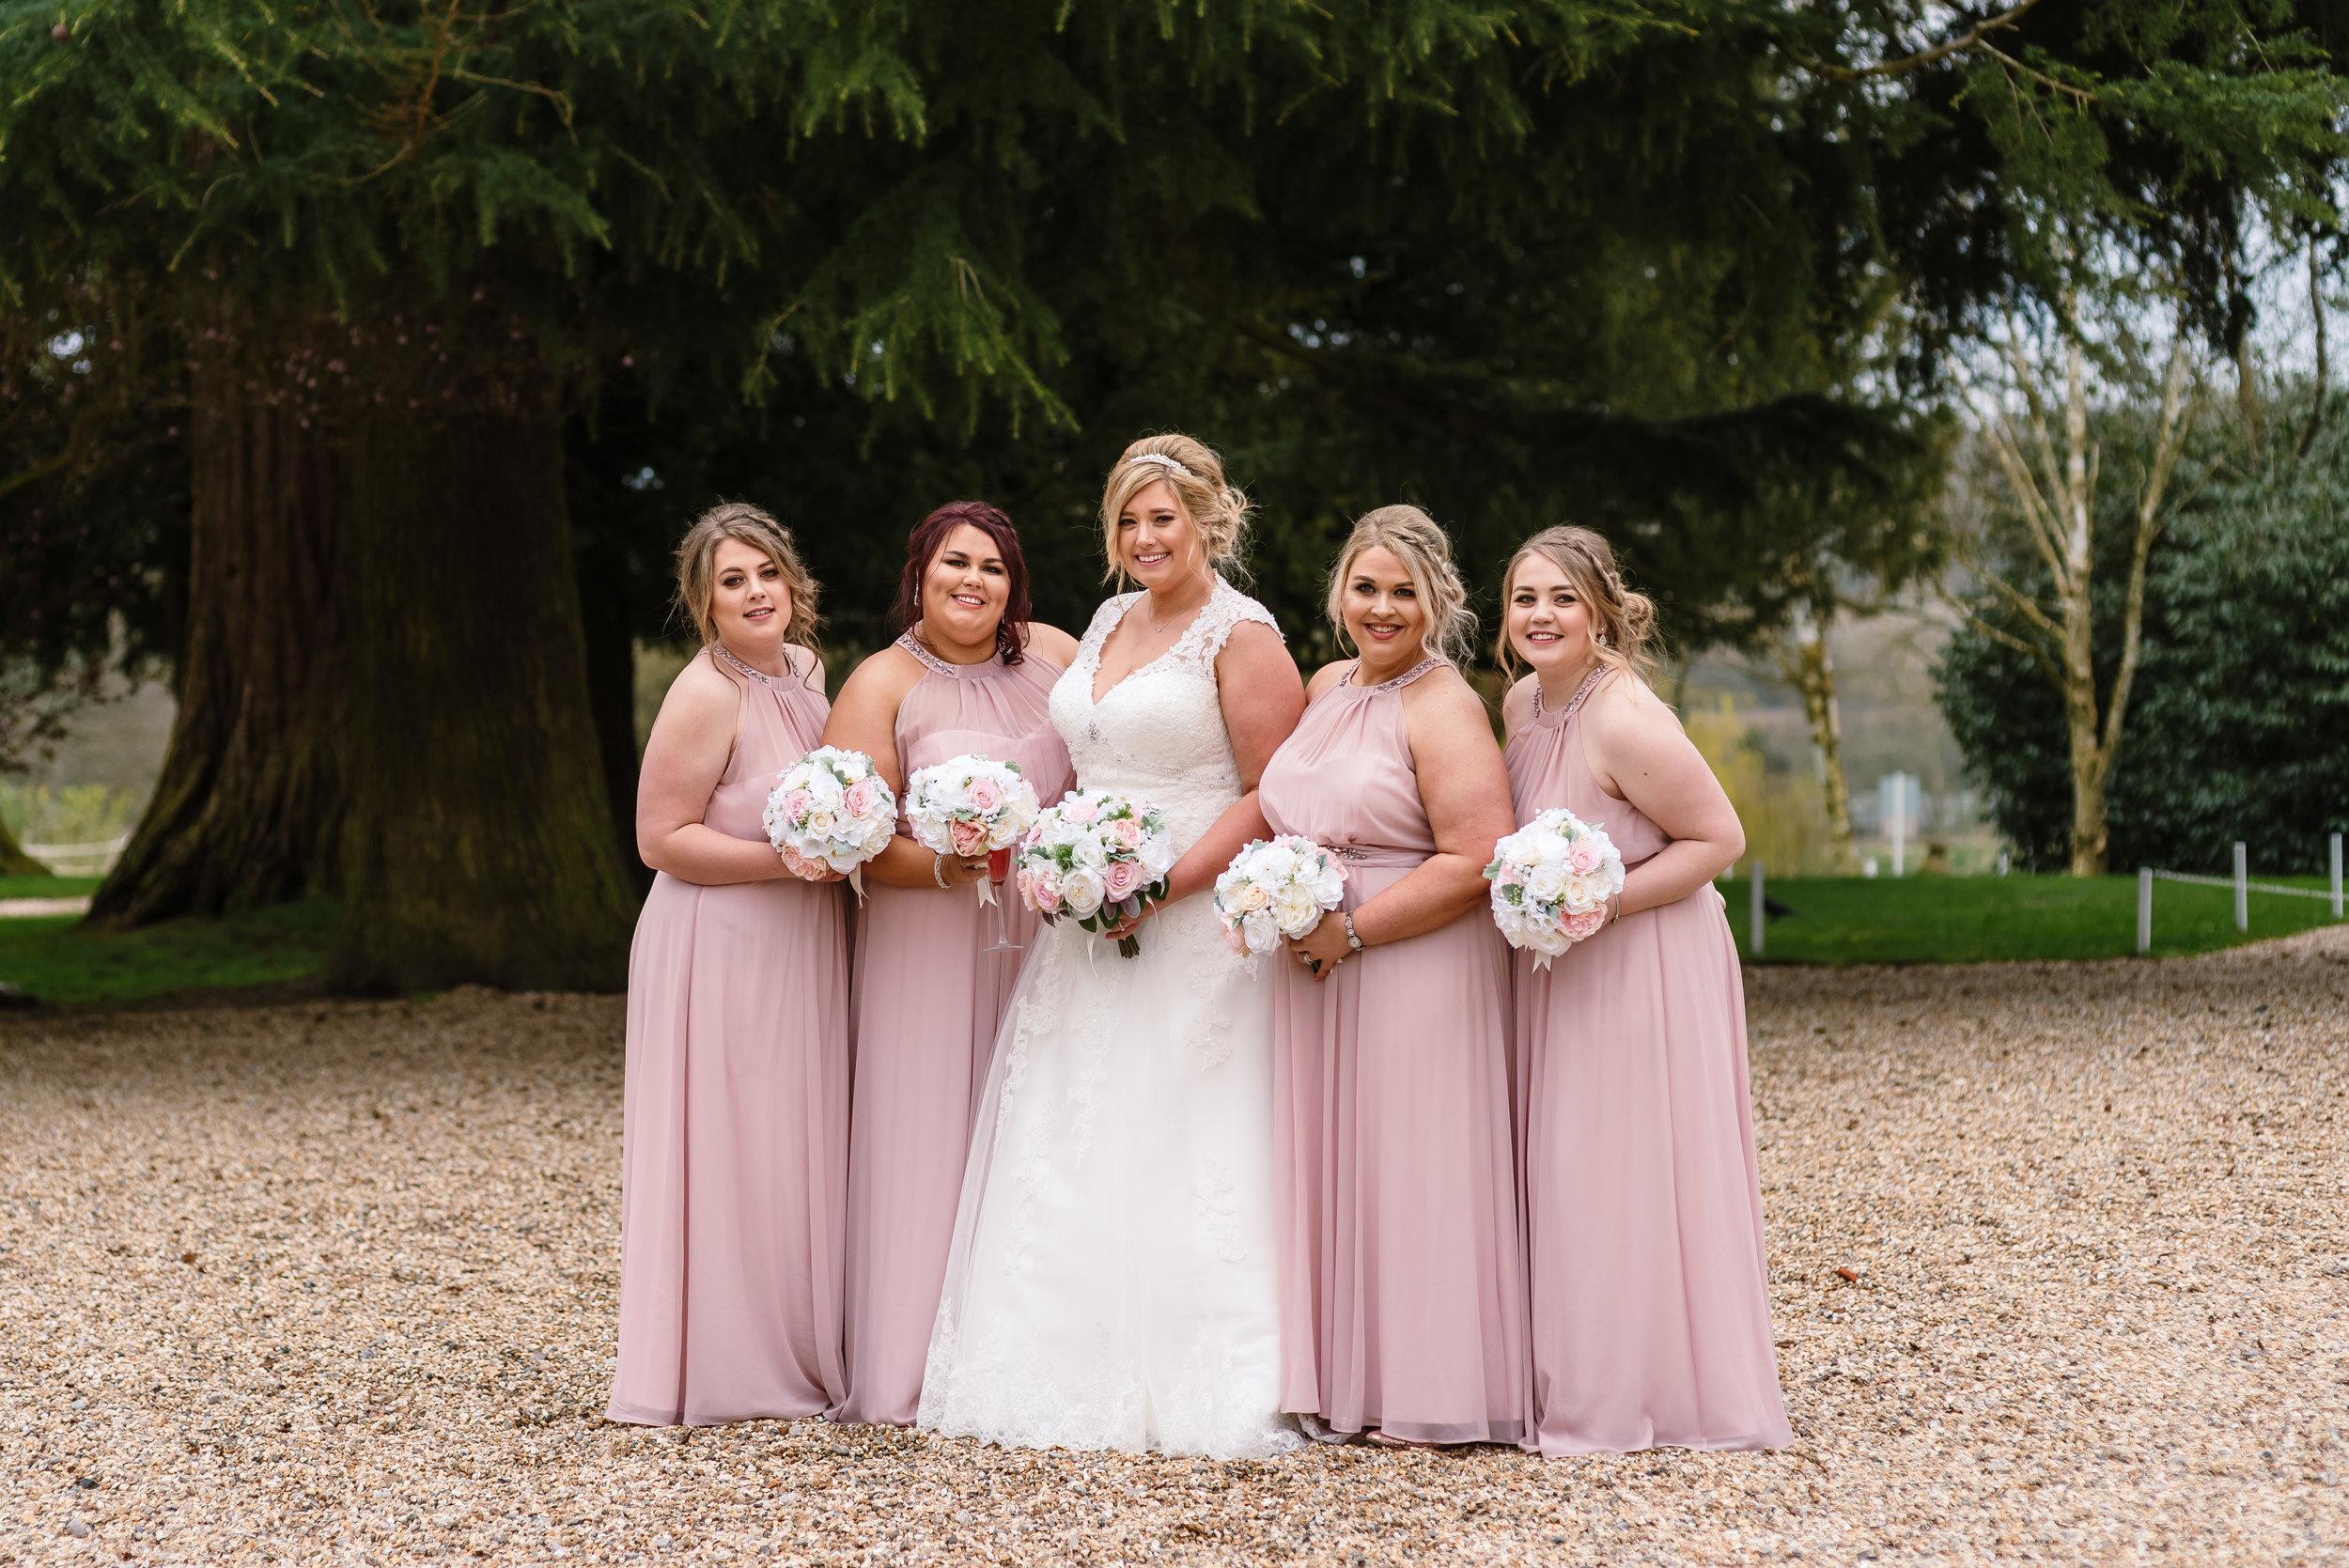 Sarah-Fishlock-Photography : Hampshire-wedding-photographer-hampshire : fleet-wedding-photographer-fleet : Northbrook-Park-Wedding-Photographer : Northbrook-Park-Wedding-Venue : natural-wedding-photographer-hampshire-673.jpg